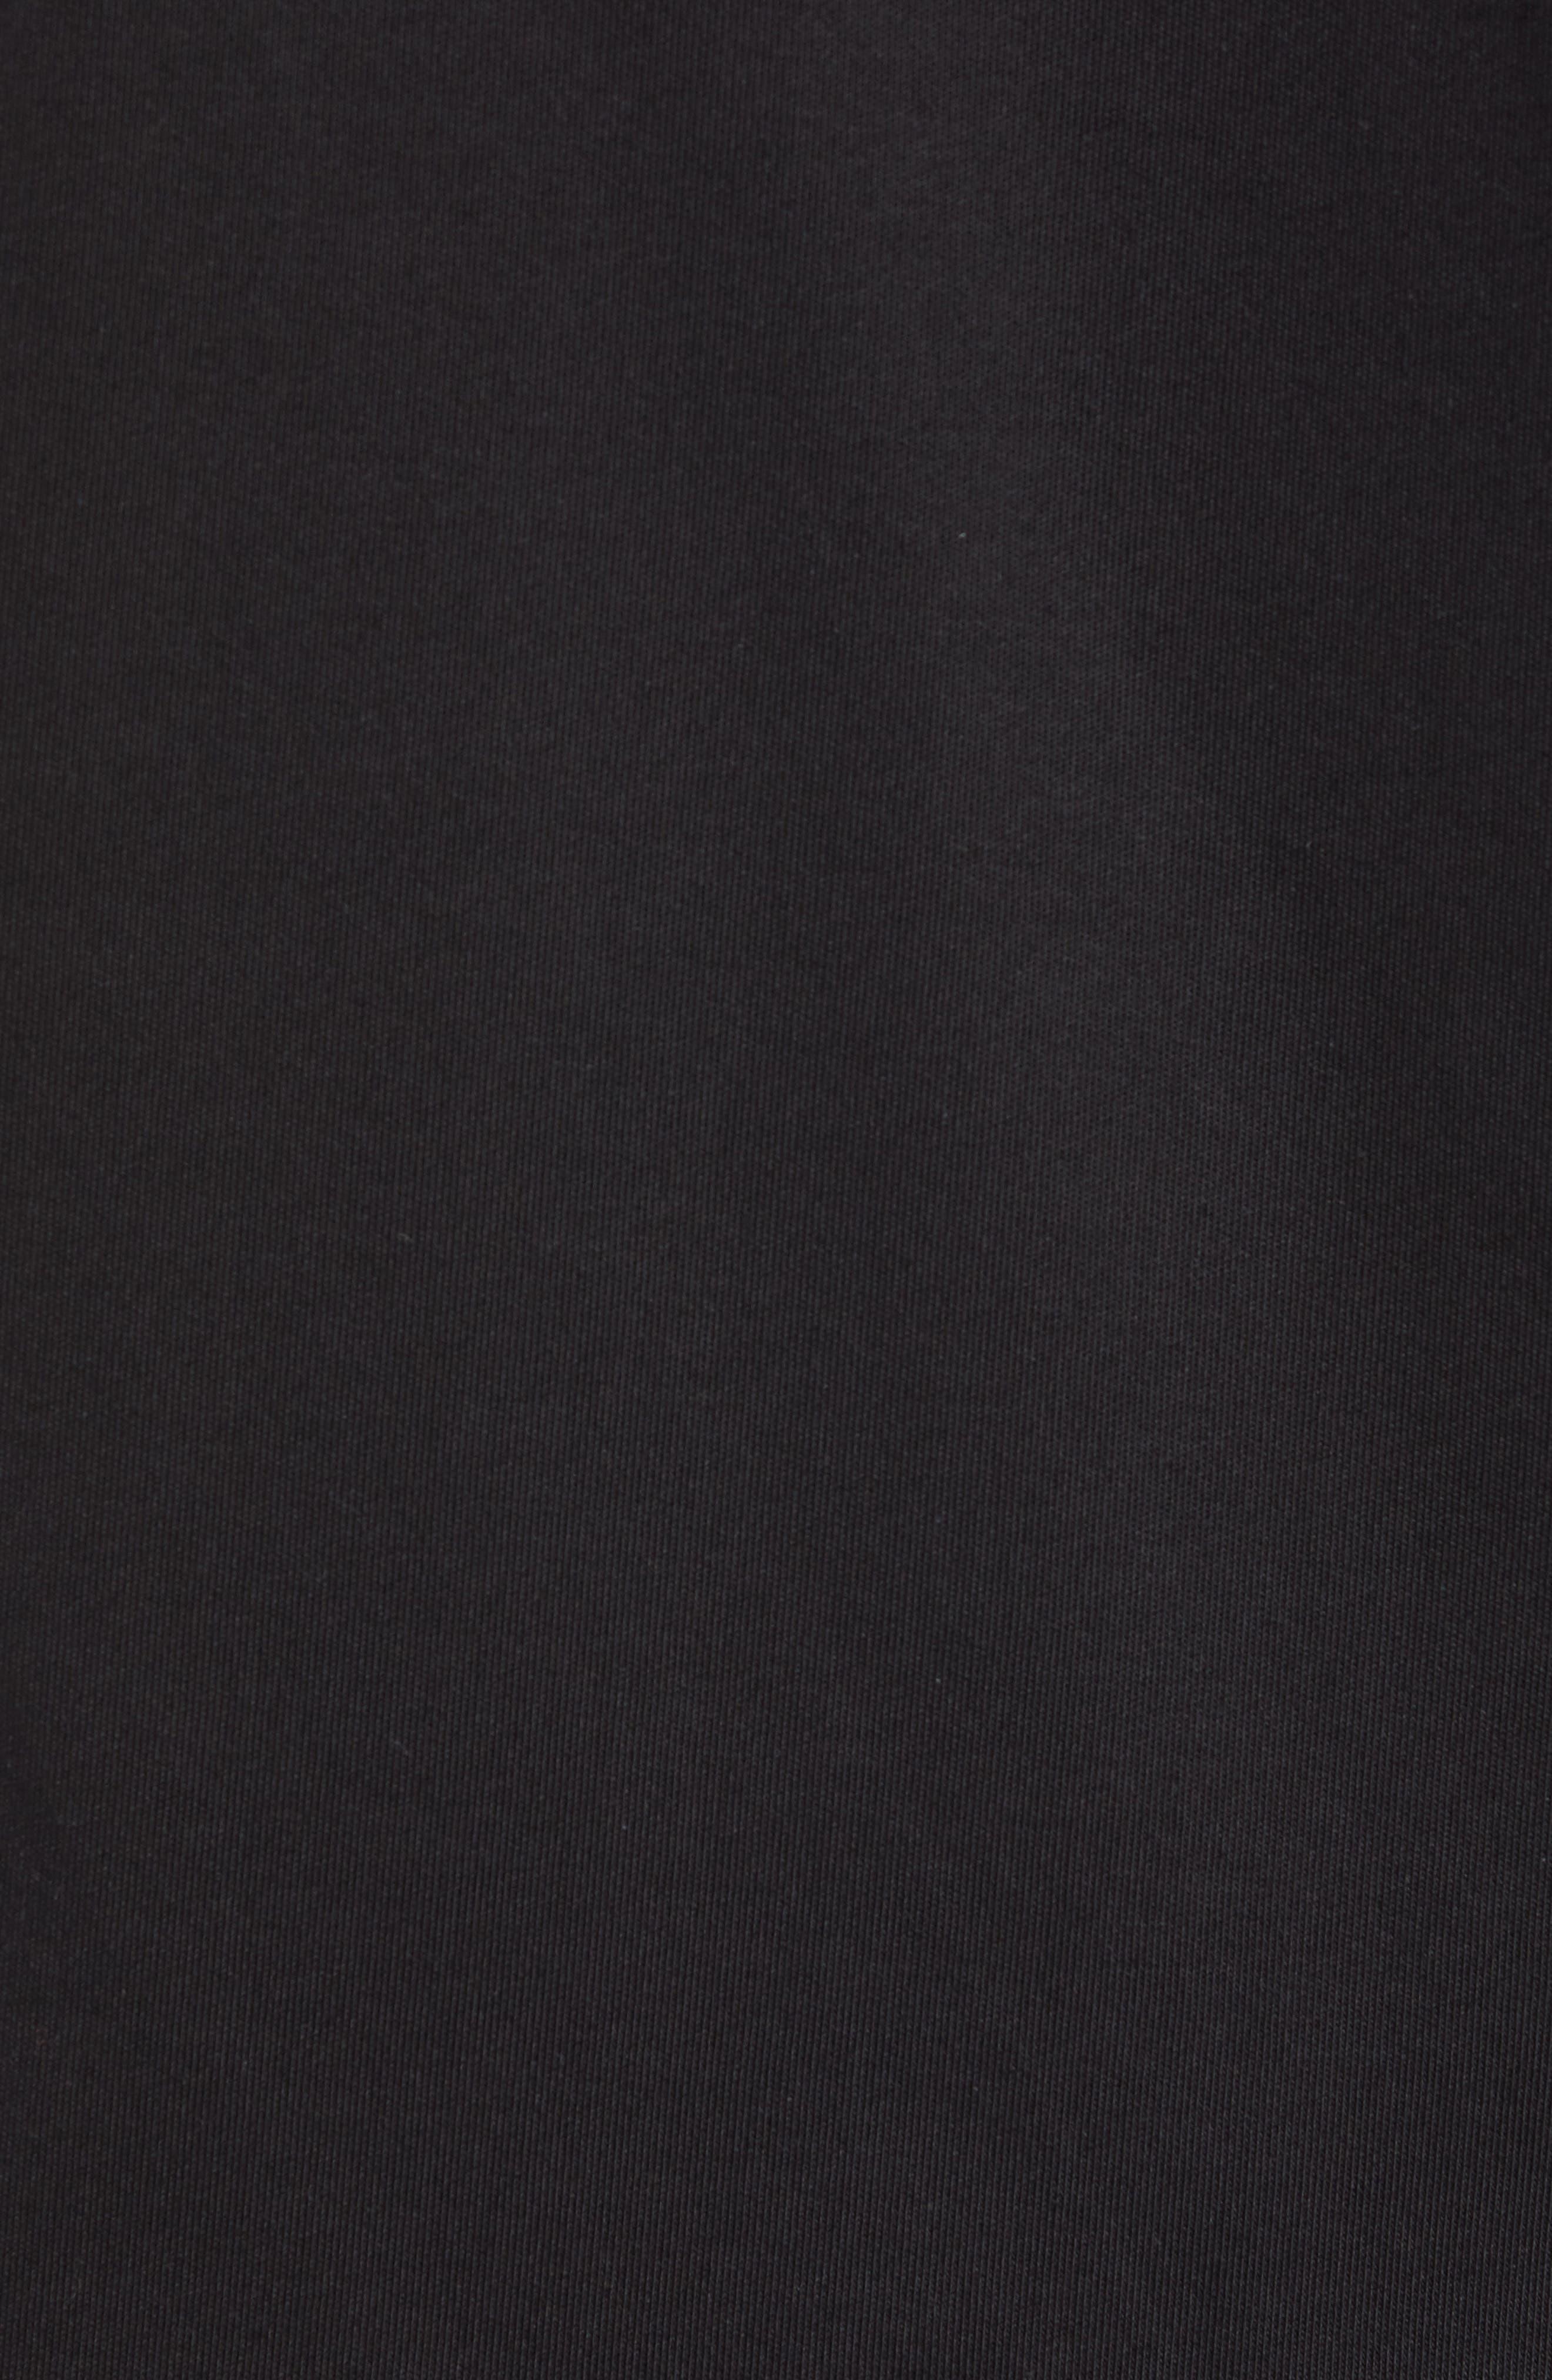 Darti Hoodie Sweatshirt,                             Alternate thumbnail 5, color,                             001